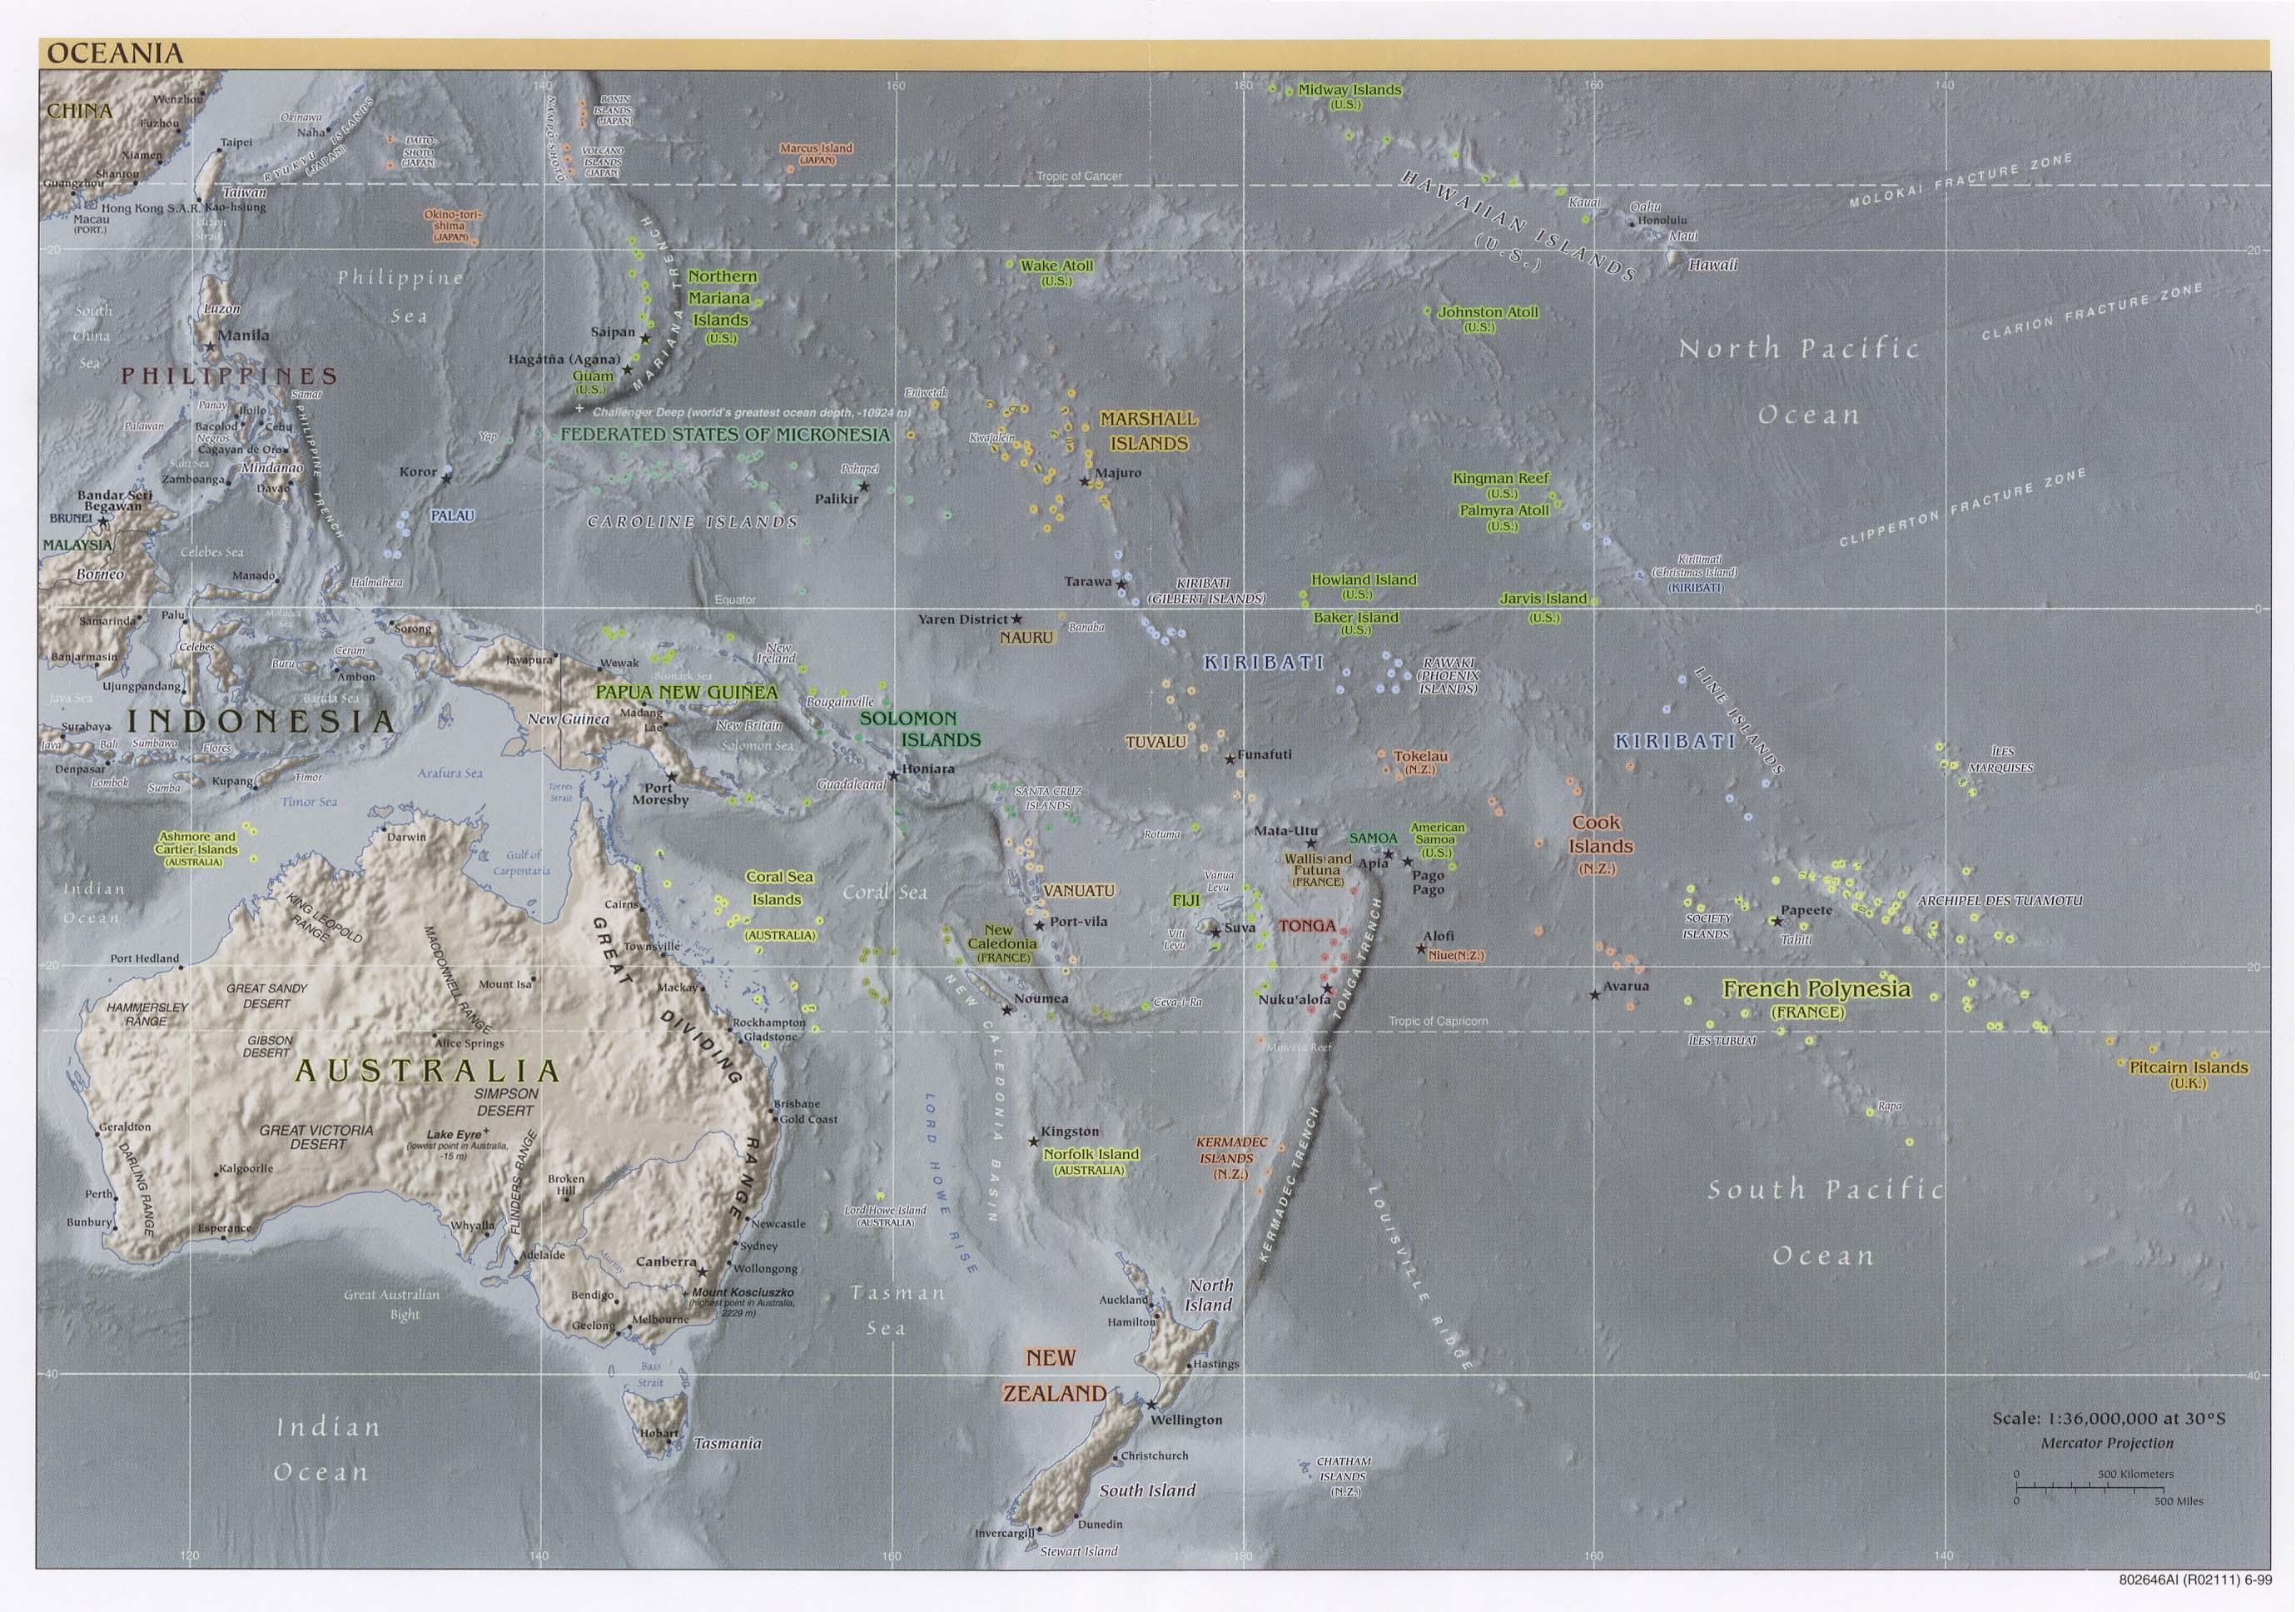 Casta eda Map Collection UT ONC